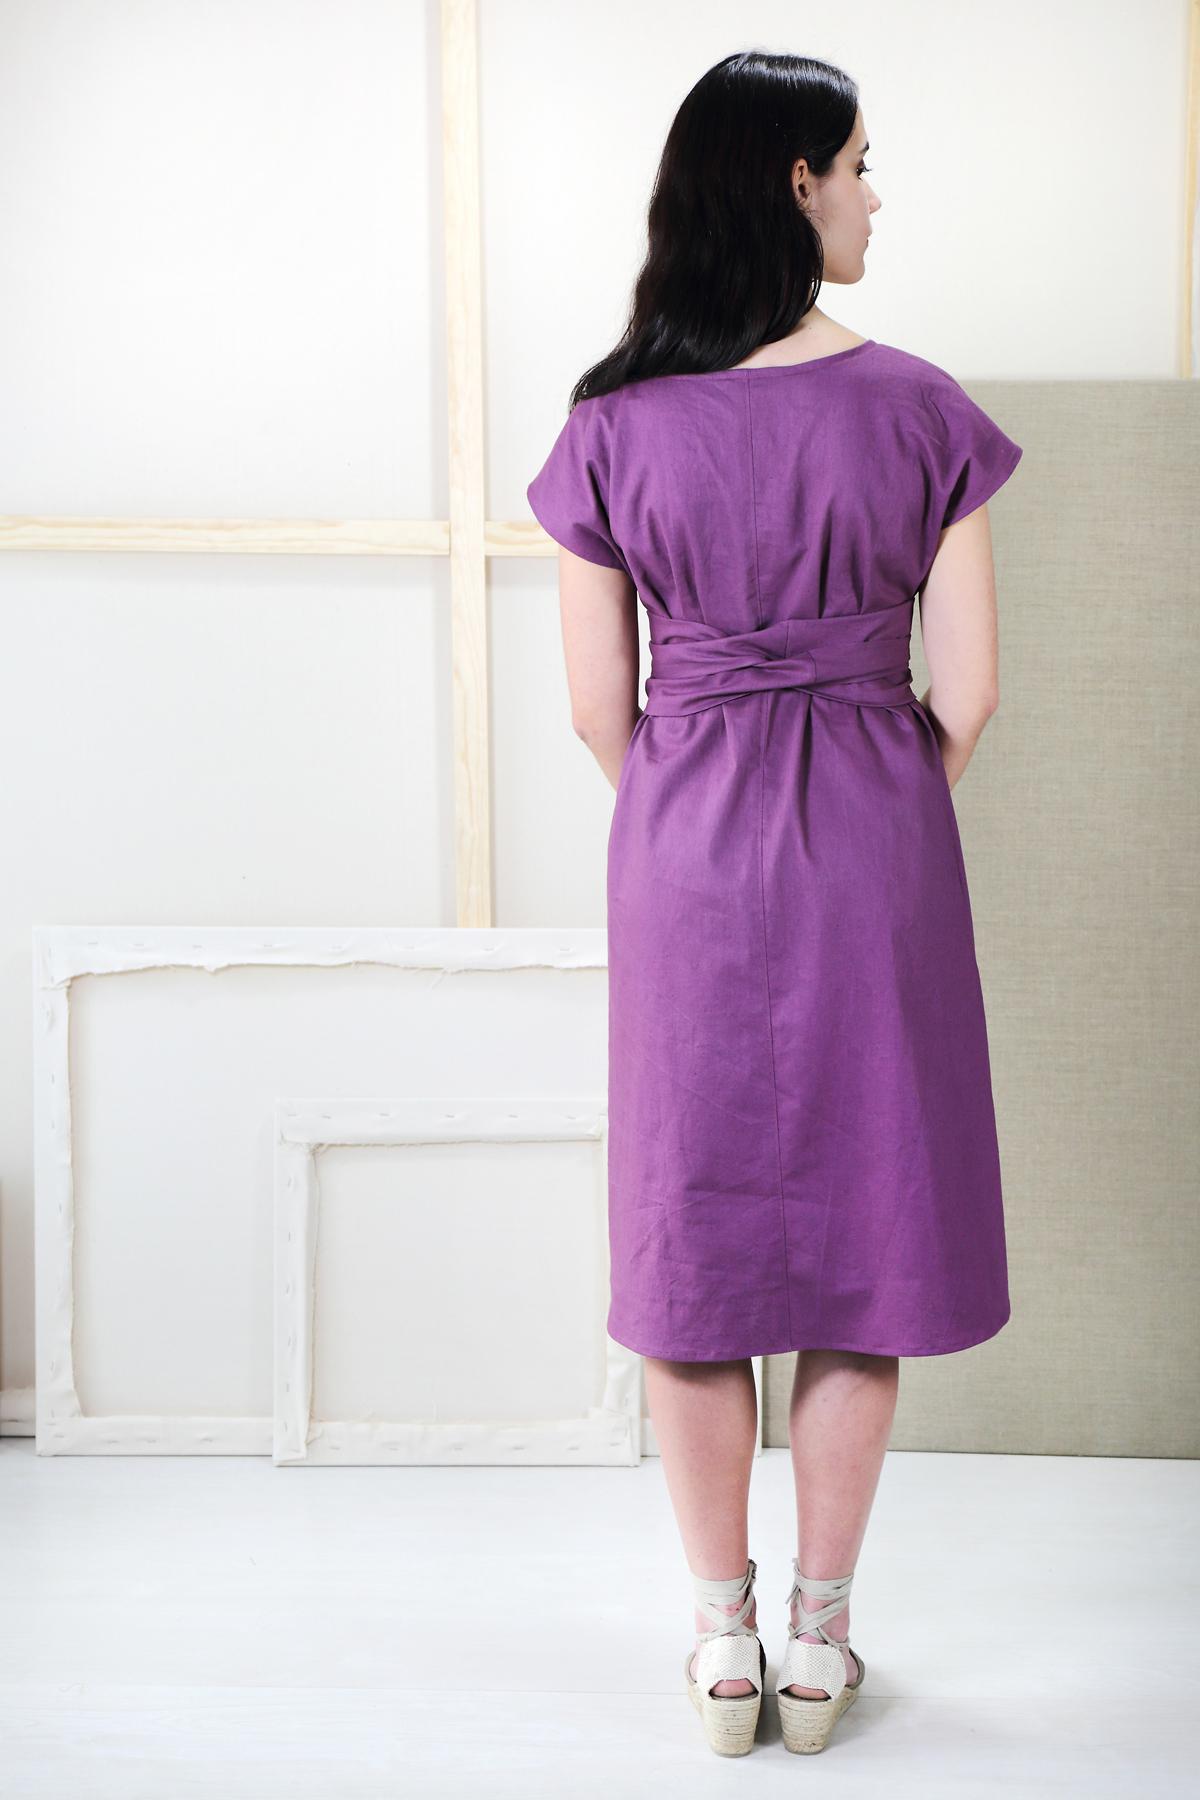 Introducing the Liesl + Co. Terrace Dress Sewing Pattern | Blog ...